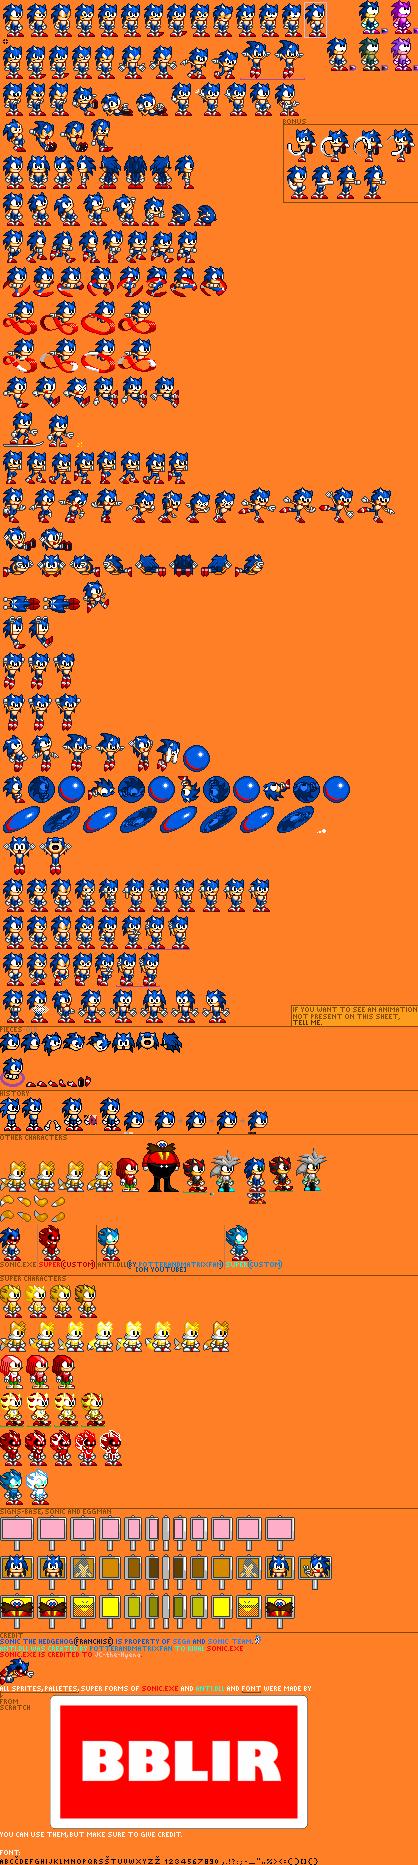 Custom / Edited - Sonic the Hedgehog Customs - Sonic - The